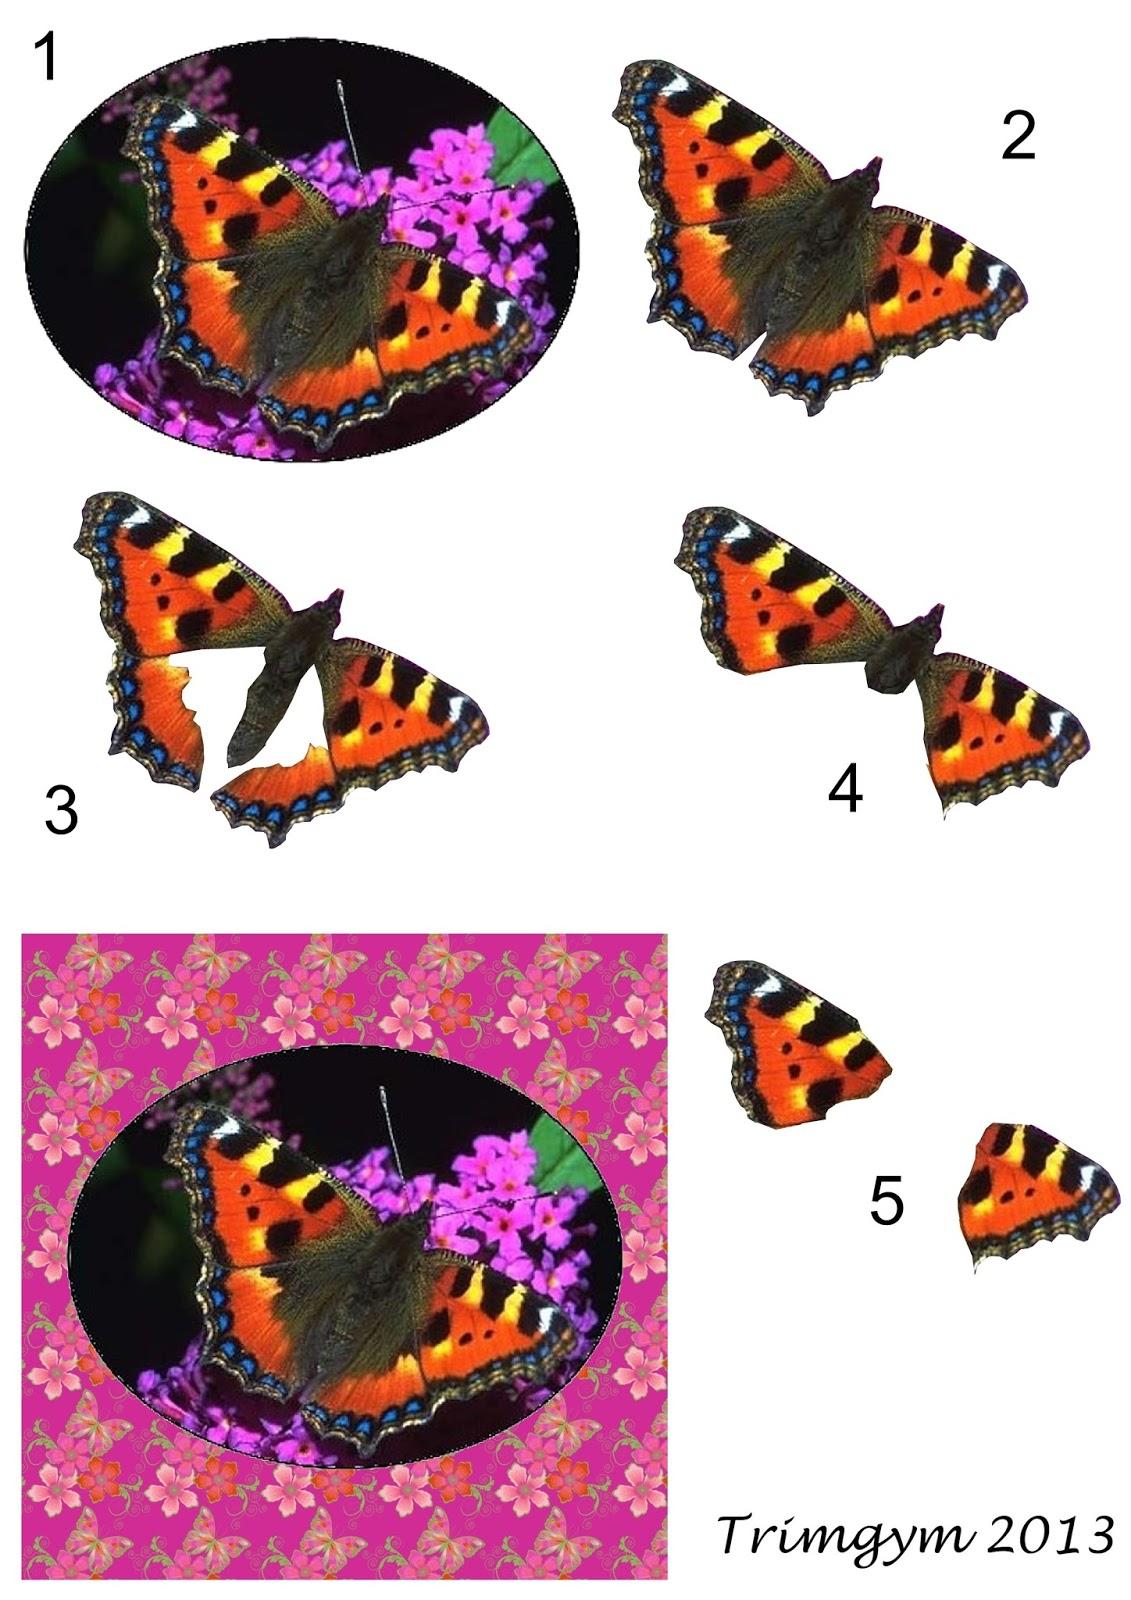 http://4.bp.blogspot.com/-NoklBT059Eo/UxILcLsAzfI/AAAAAAAASHY/bajMp7HBc8w/s1600/Butterfly+Decoupage+Topper+4++by+Trimgym.jpg